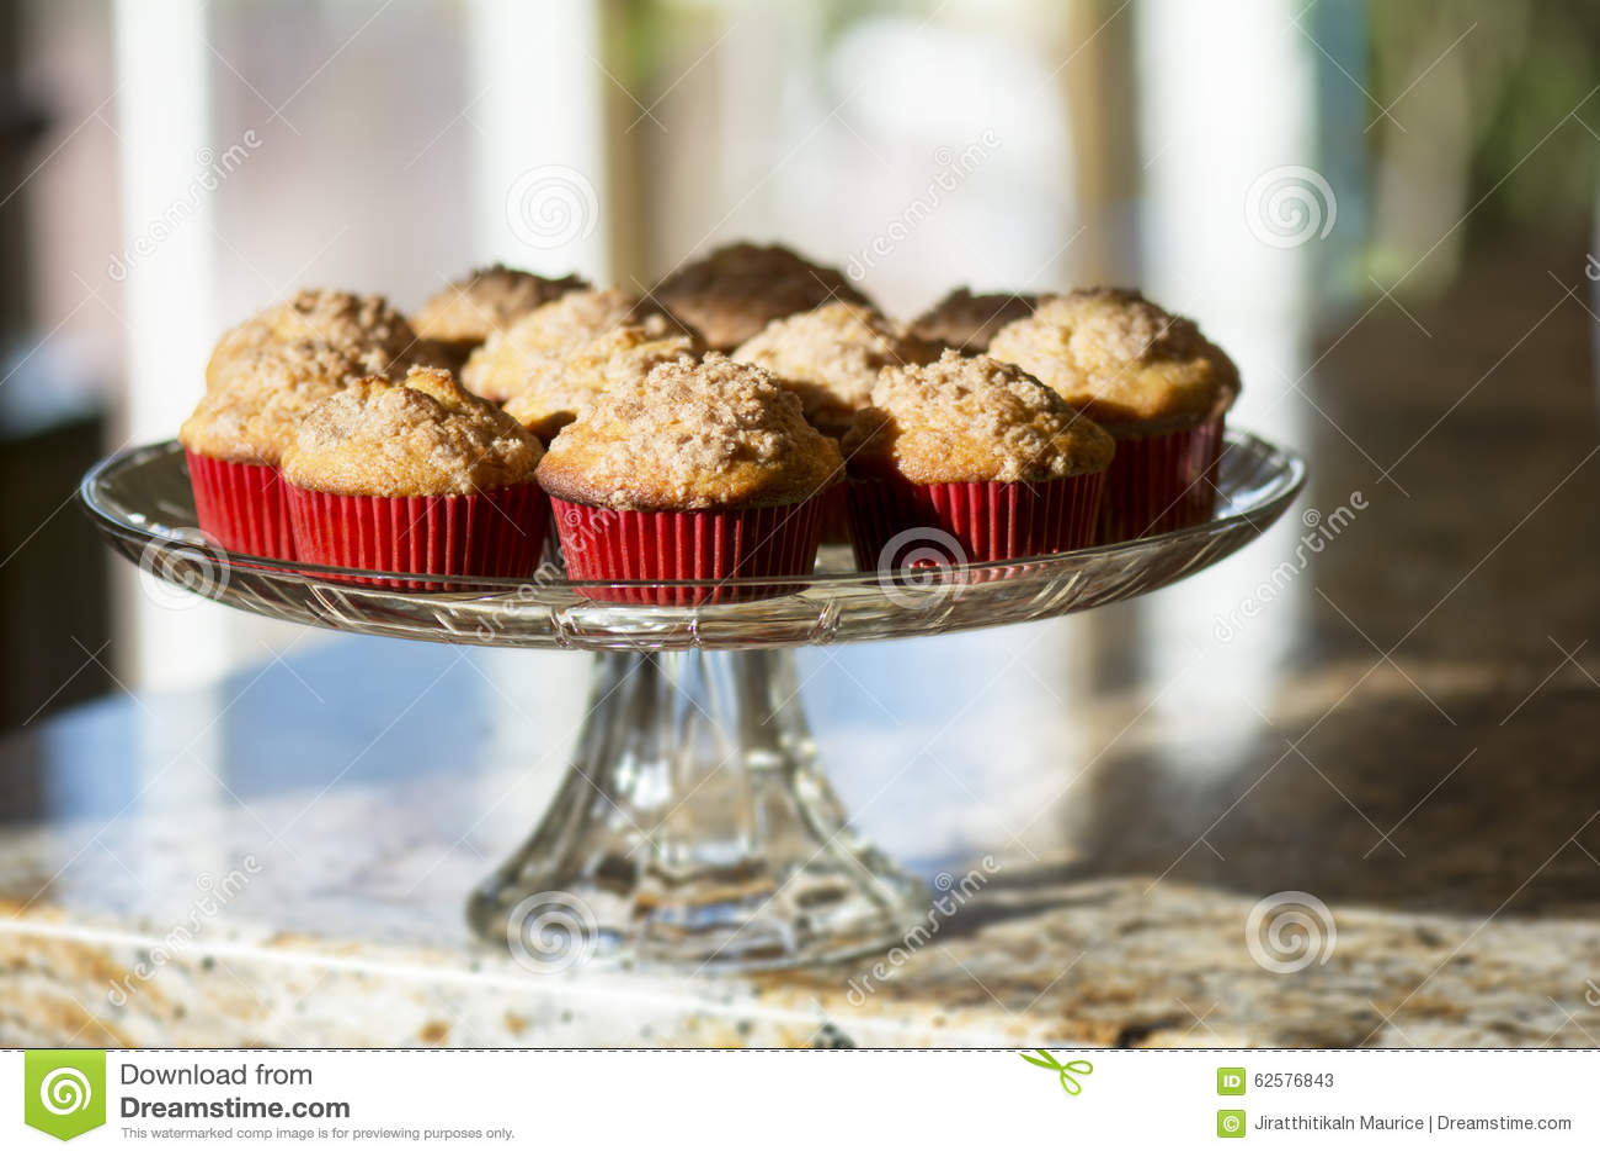 granite top kitchen cart high table set 在红色纸杯的香蕉松饼在蛋糕在厨台站立库存图片 图片包括有快餐 制动手 与红糖顶部的阳光光亮的香蕉松饼在清楚的玻璃cakestand的红色纸杯在厨房花岗岩工作台面